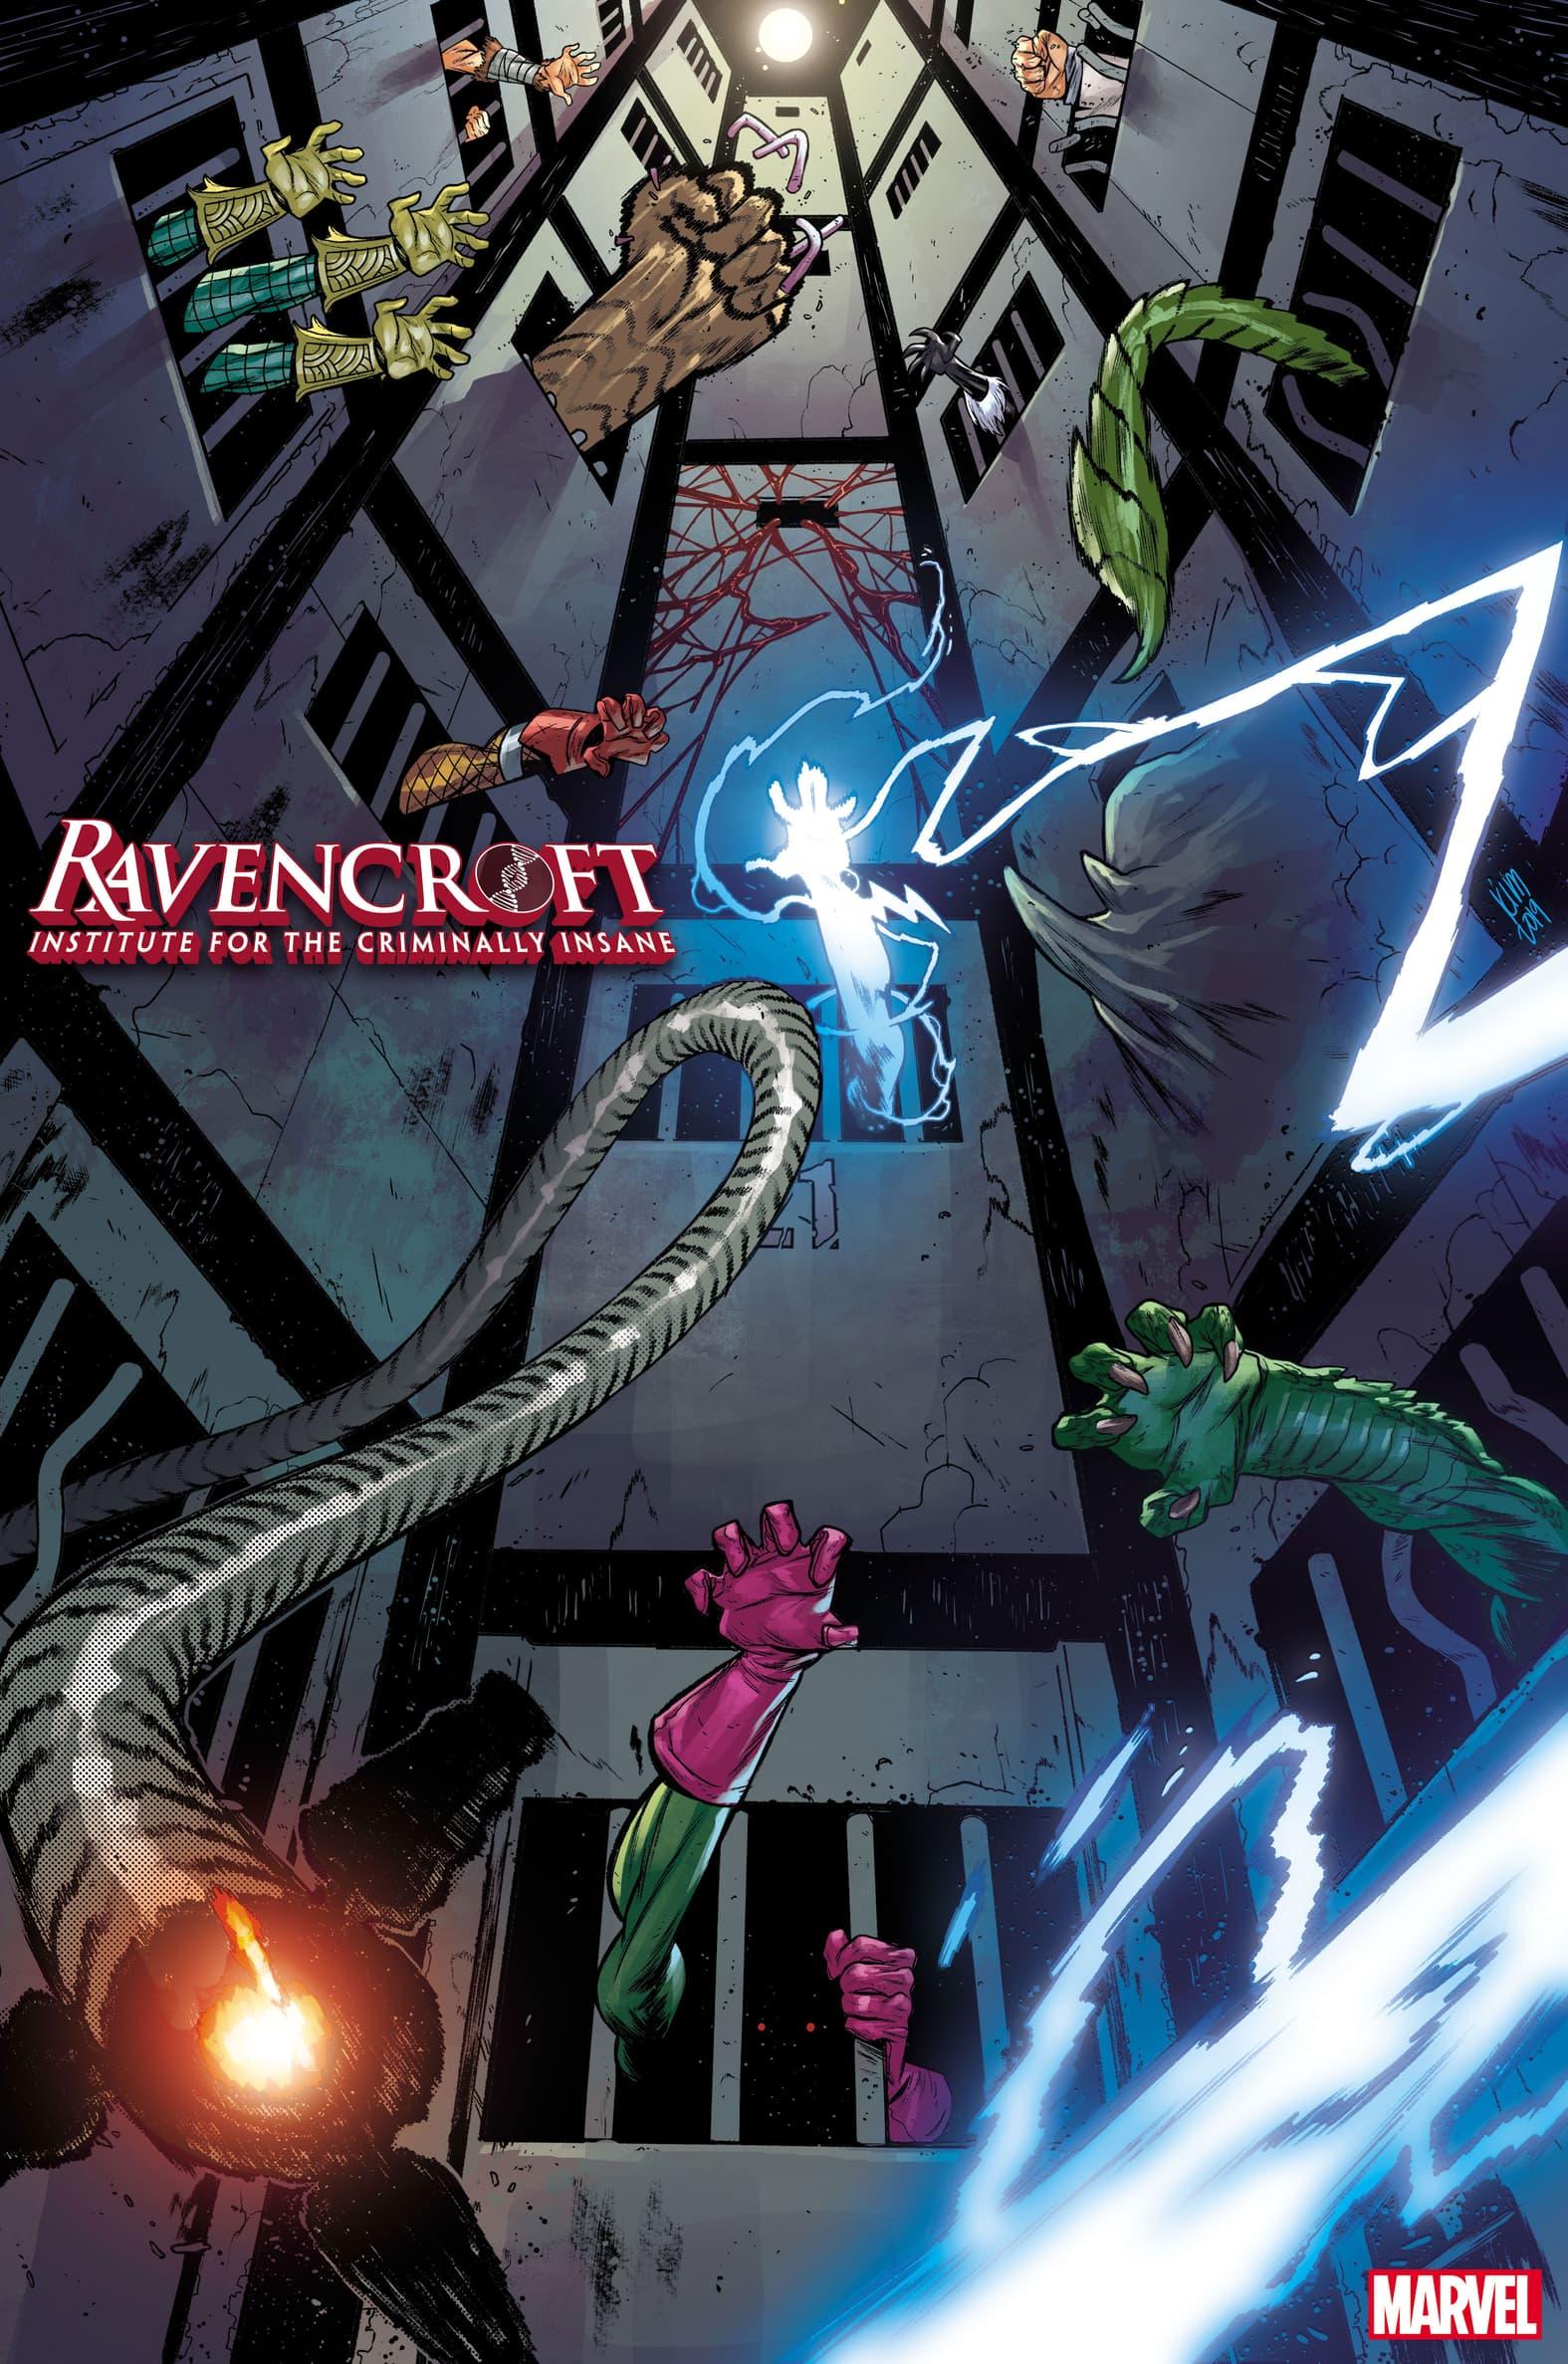 Ravencroft variant cover by Kim Jacinto